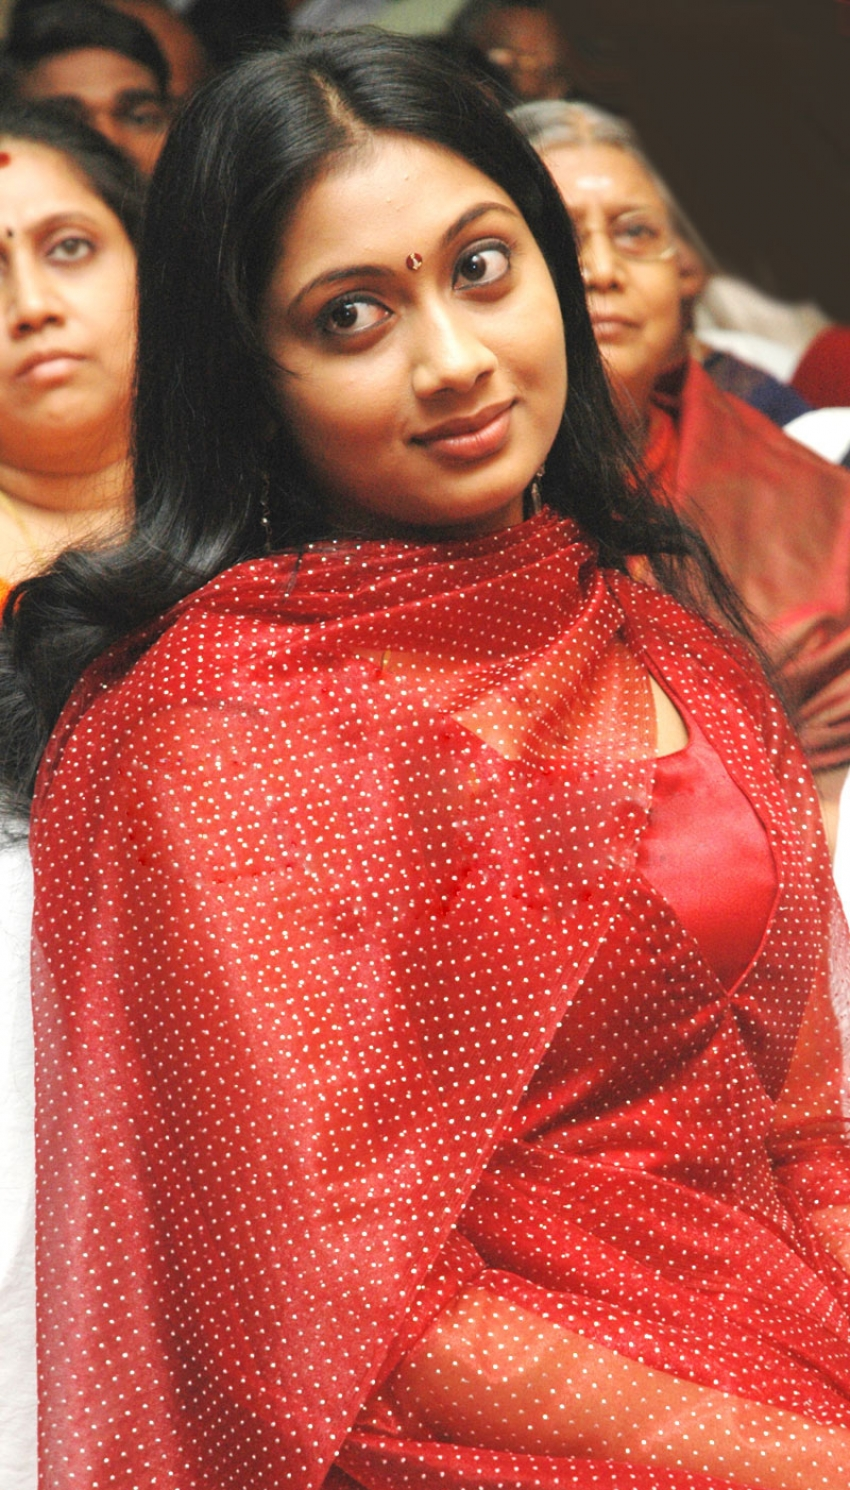 pictures Udhayathara